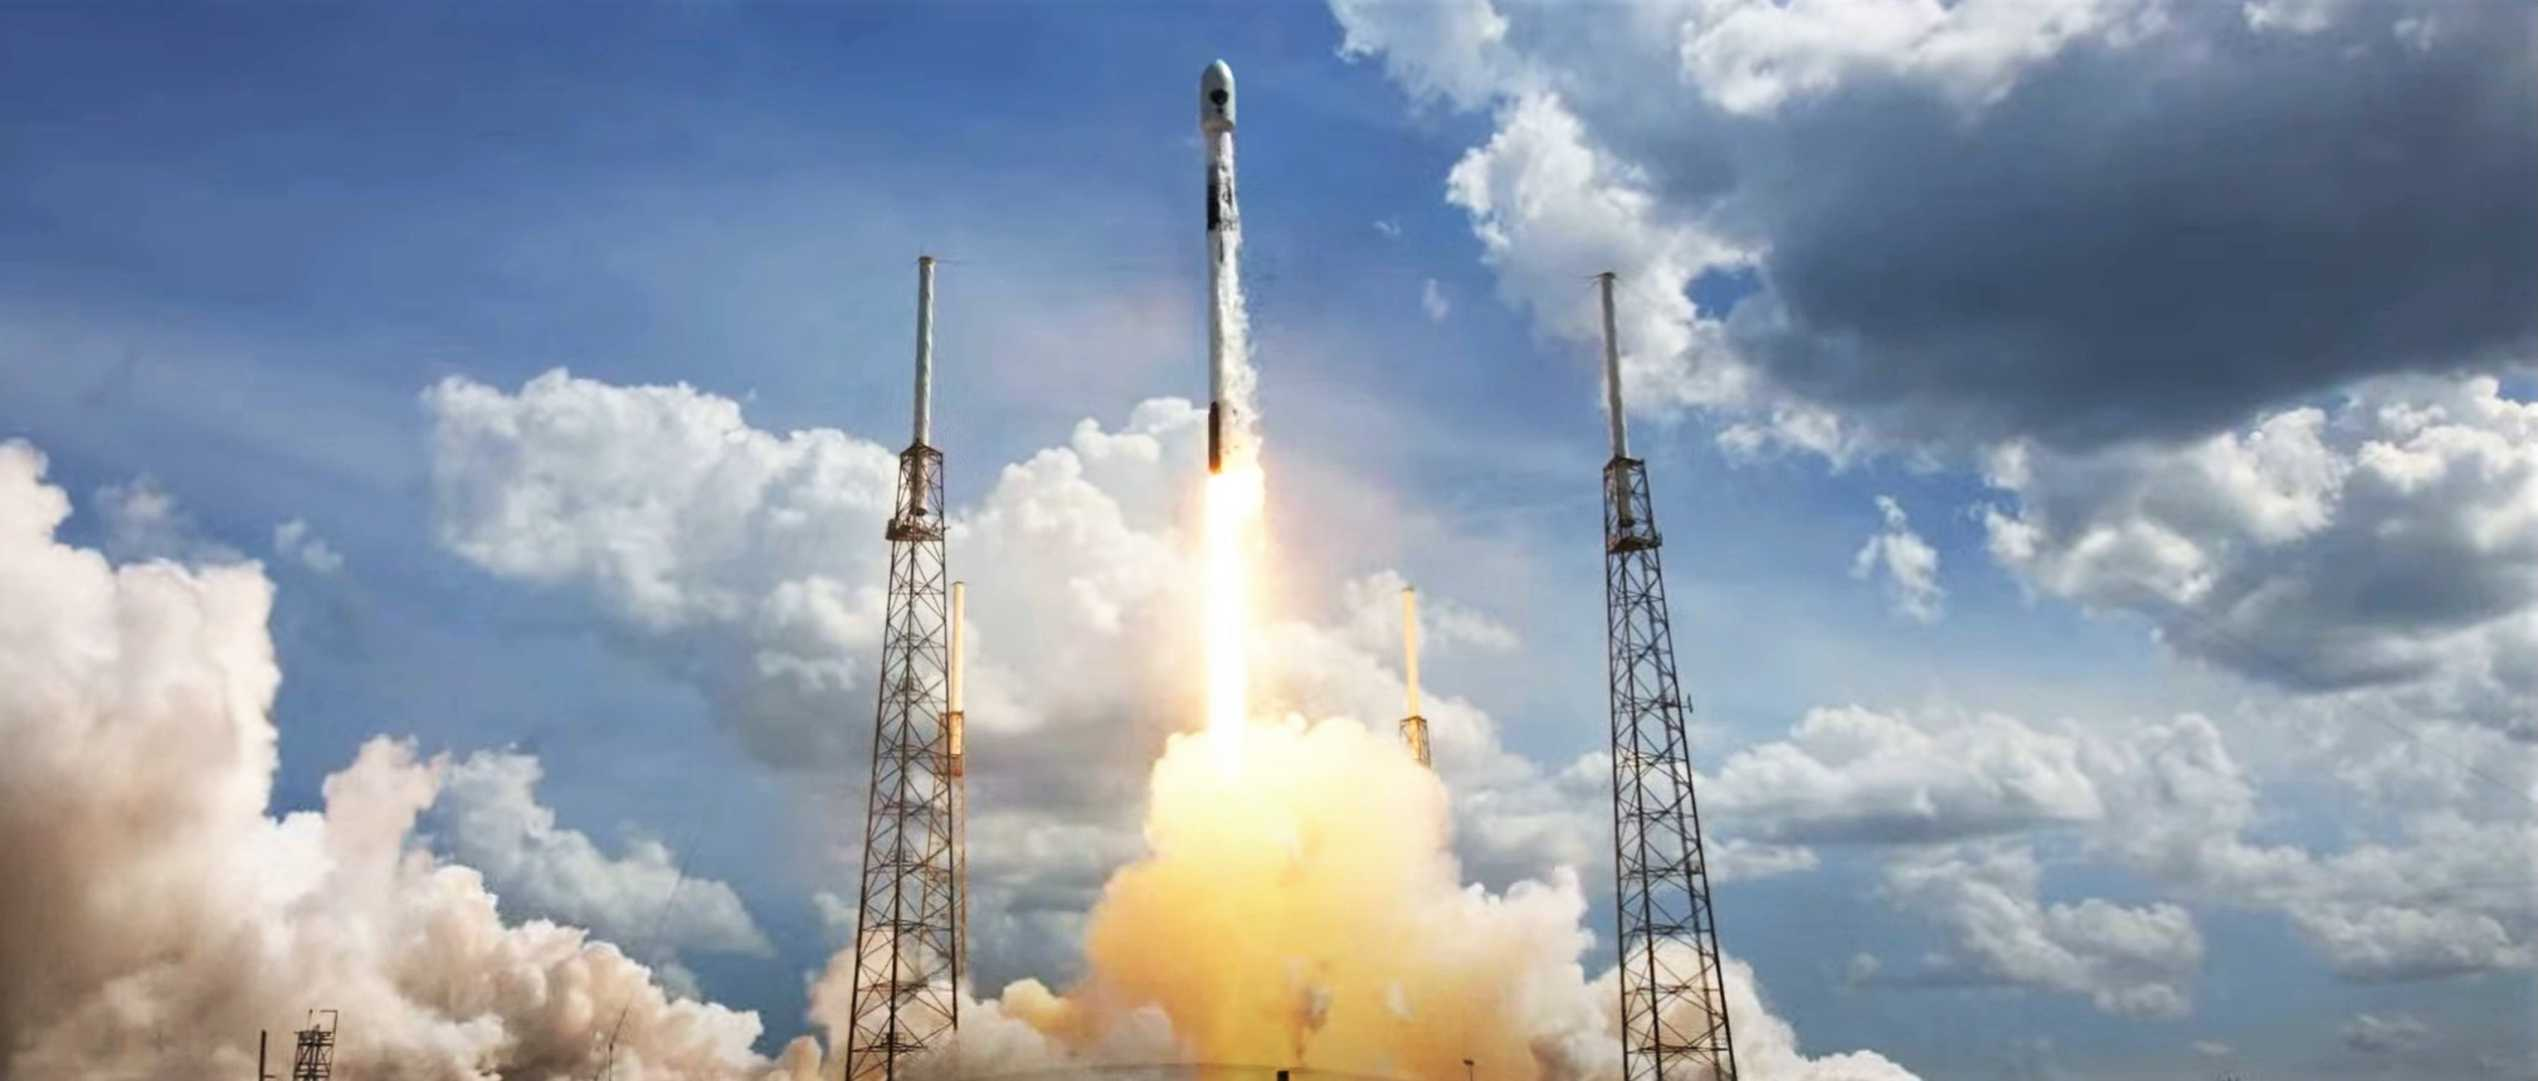 GPS III SV03 Falcon 9 B1060 webcast 063020 (SpaceX) 5 (c)